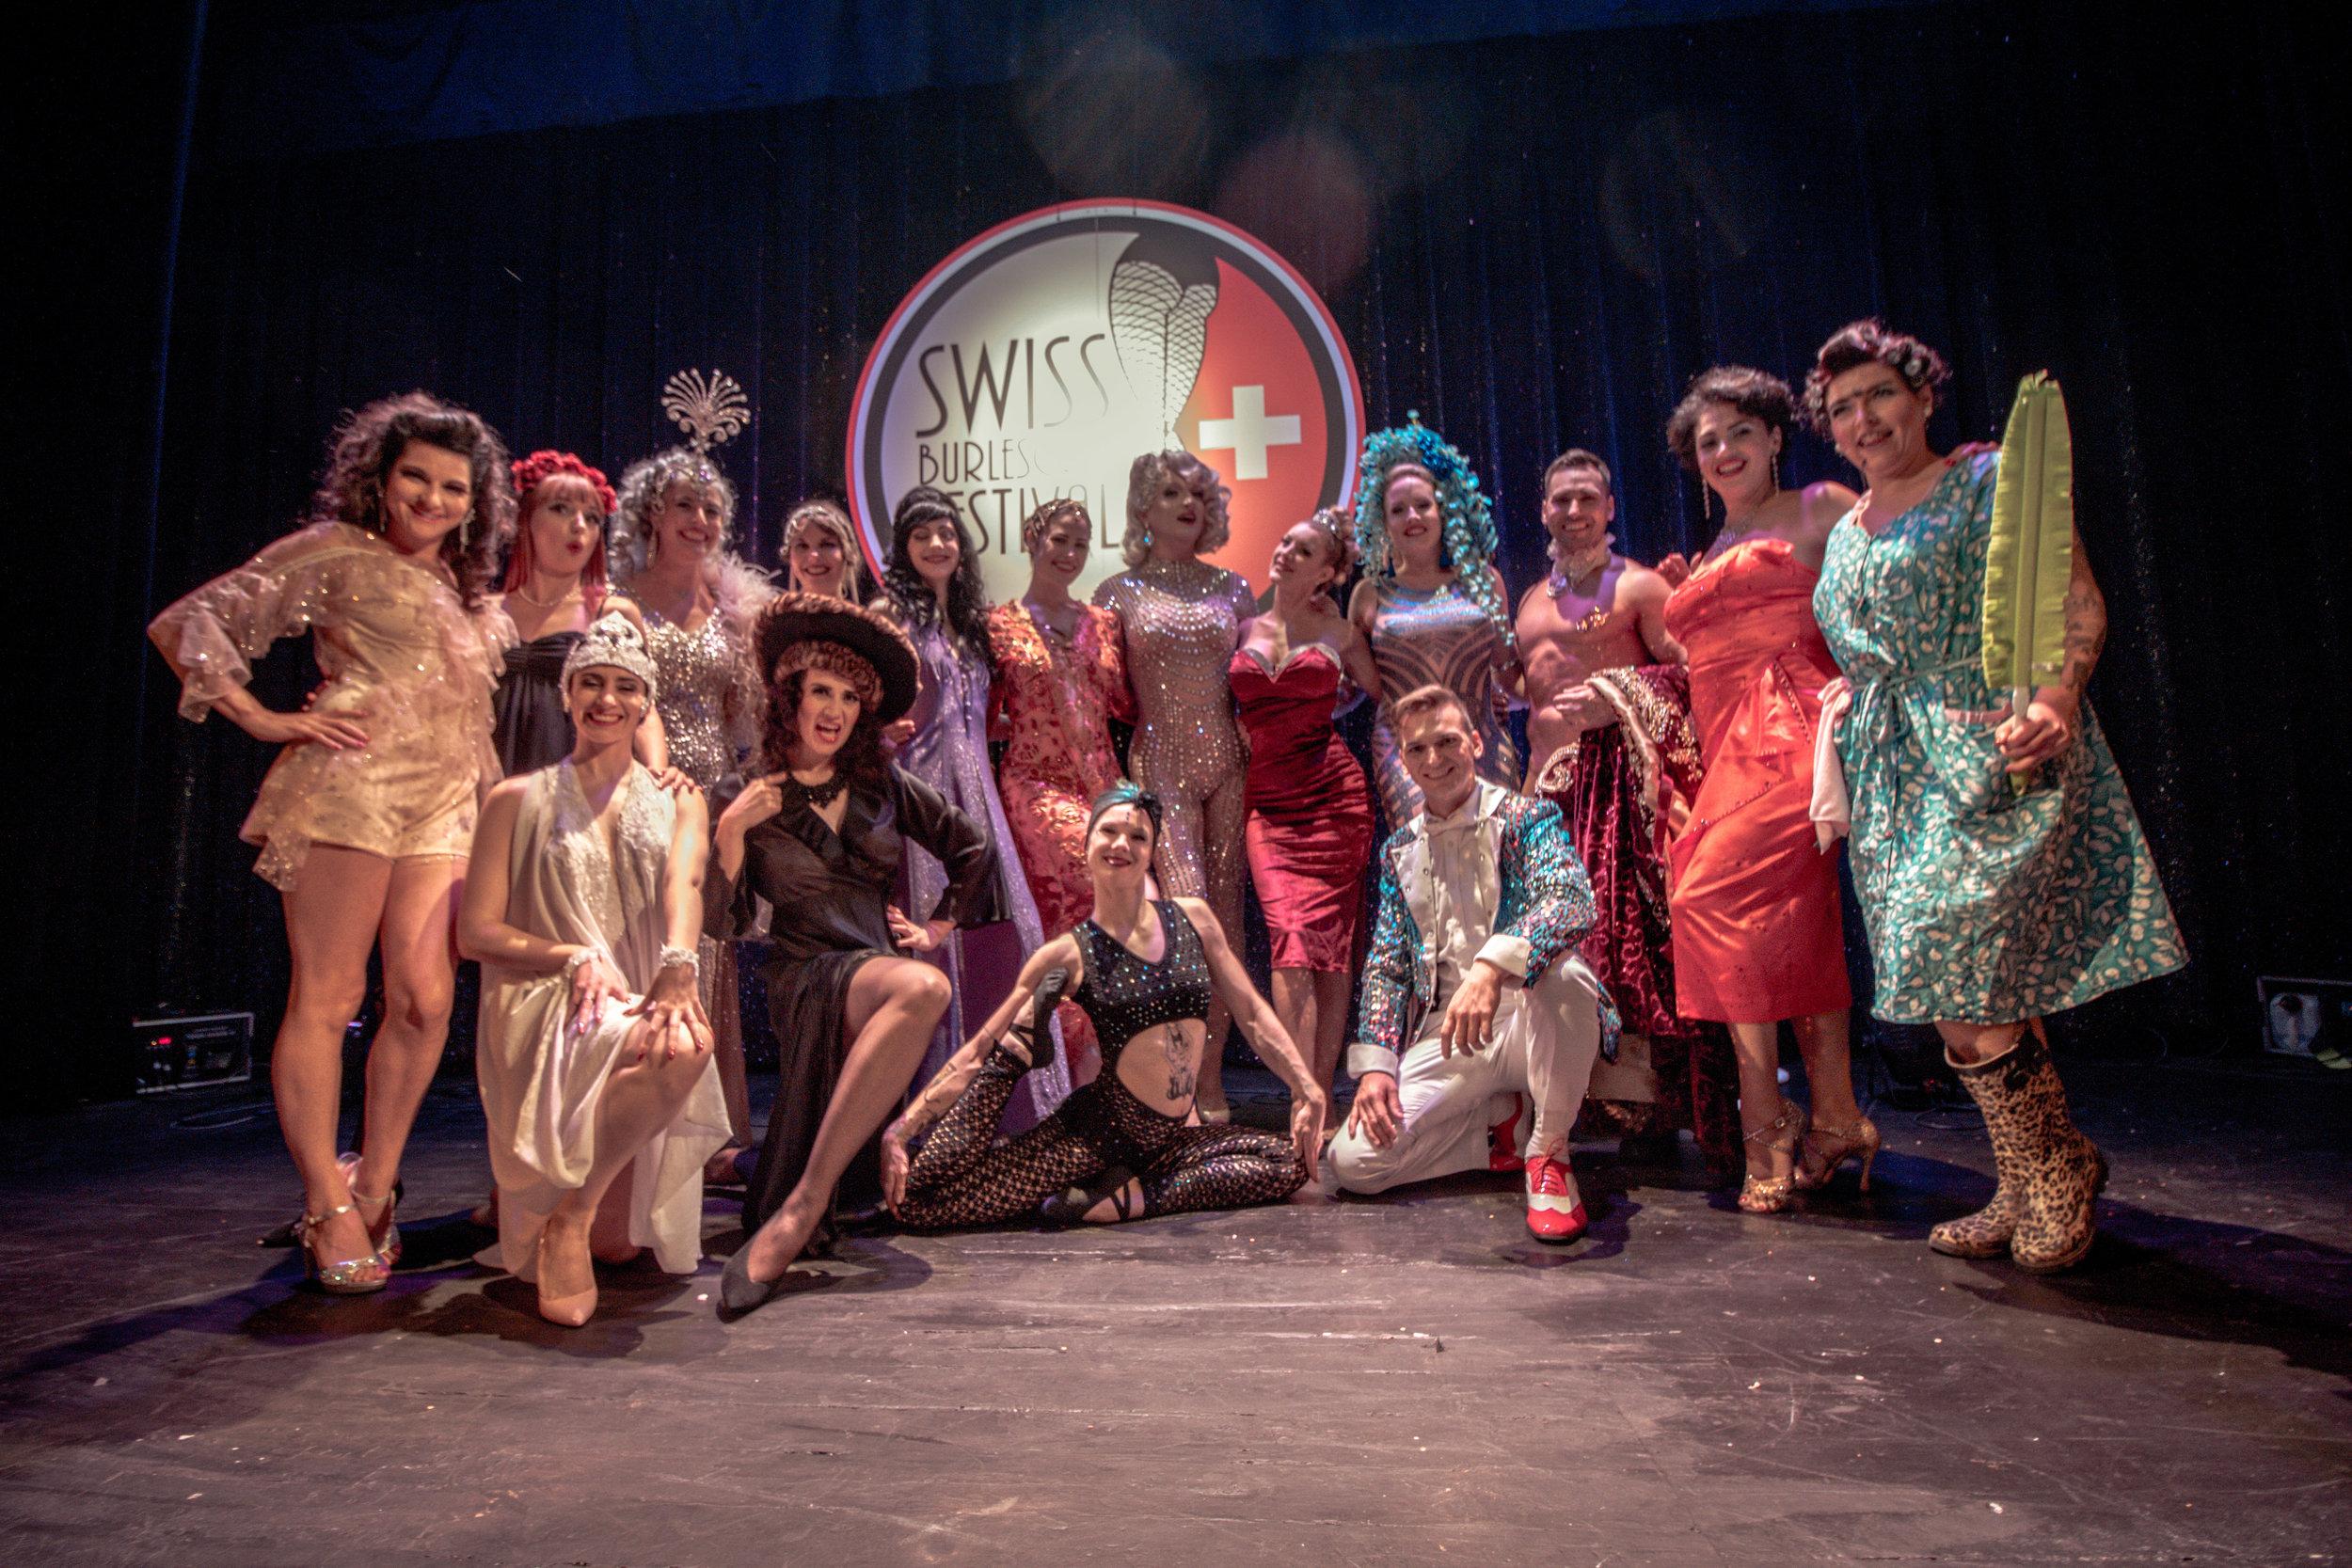 Swiss Burlesque Festival 2018 by Dirk Behlau-3458.jpg